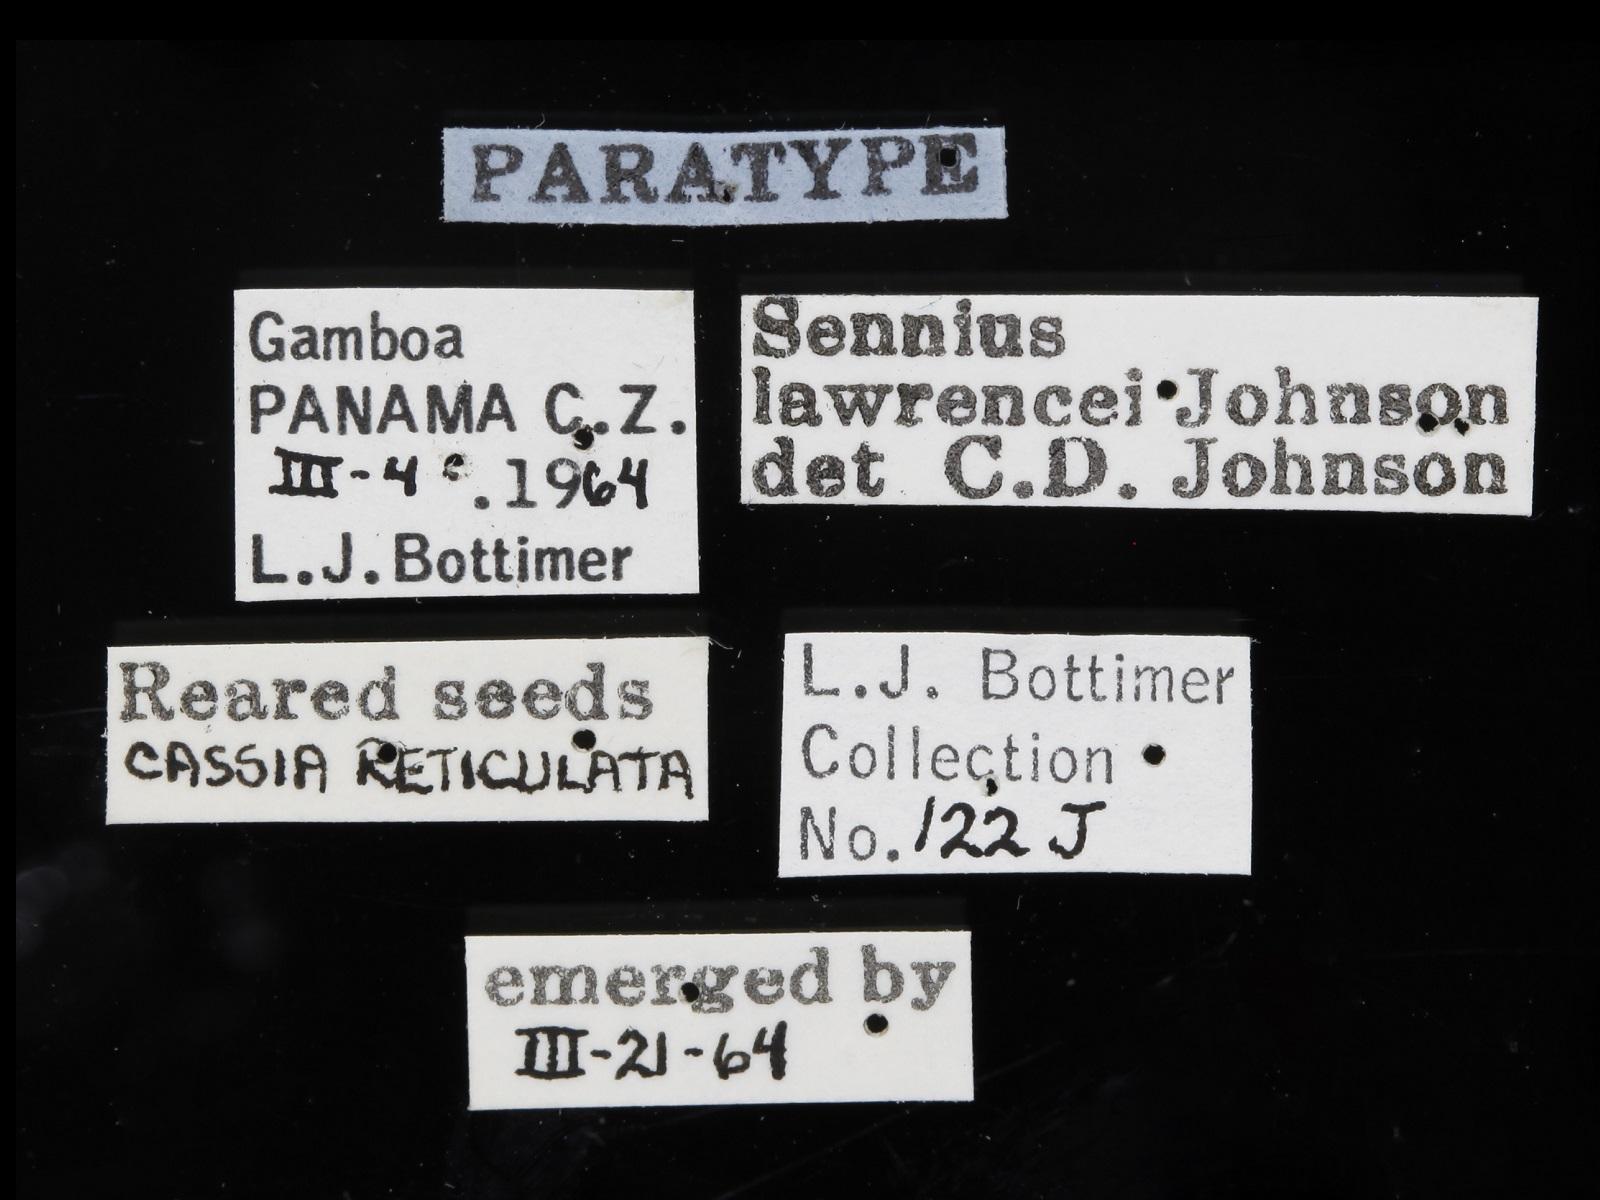 Sennius lawrencei Johnson, 1977